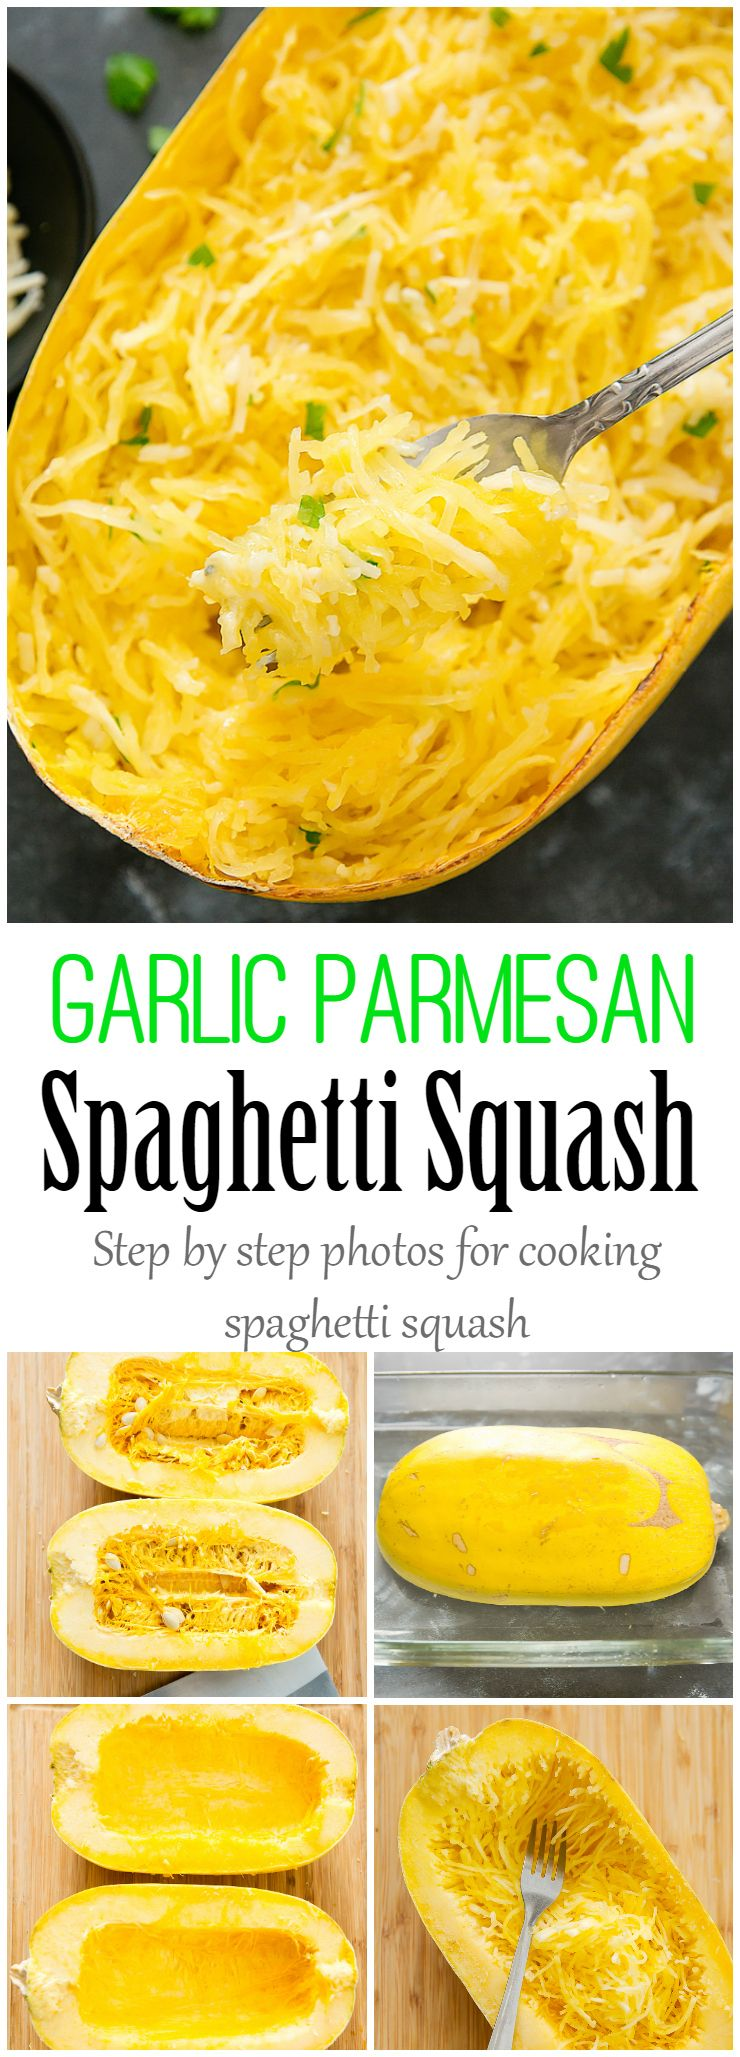 Garlic Parmesan Spaghetti Squash #spagettisquashrecipes